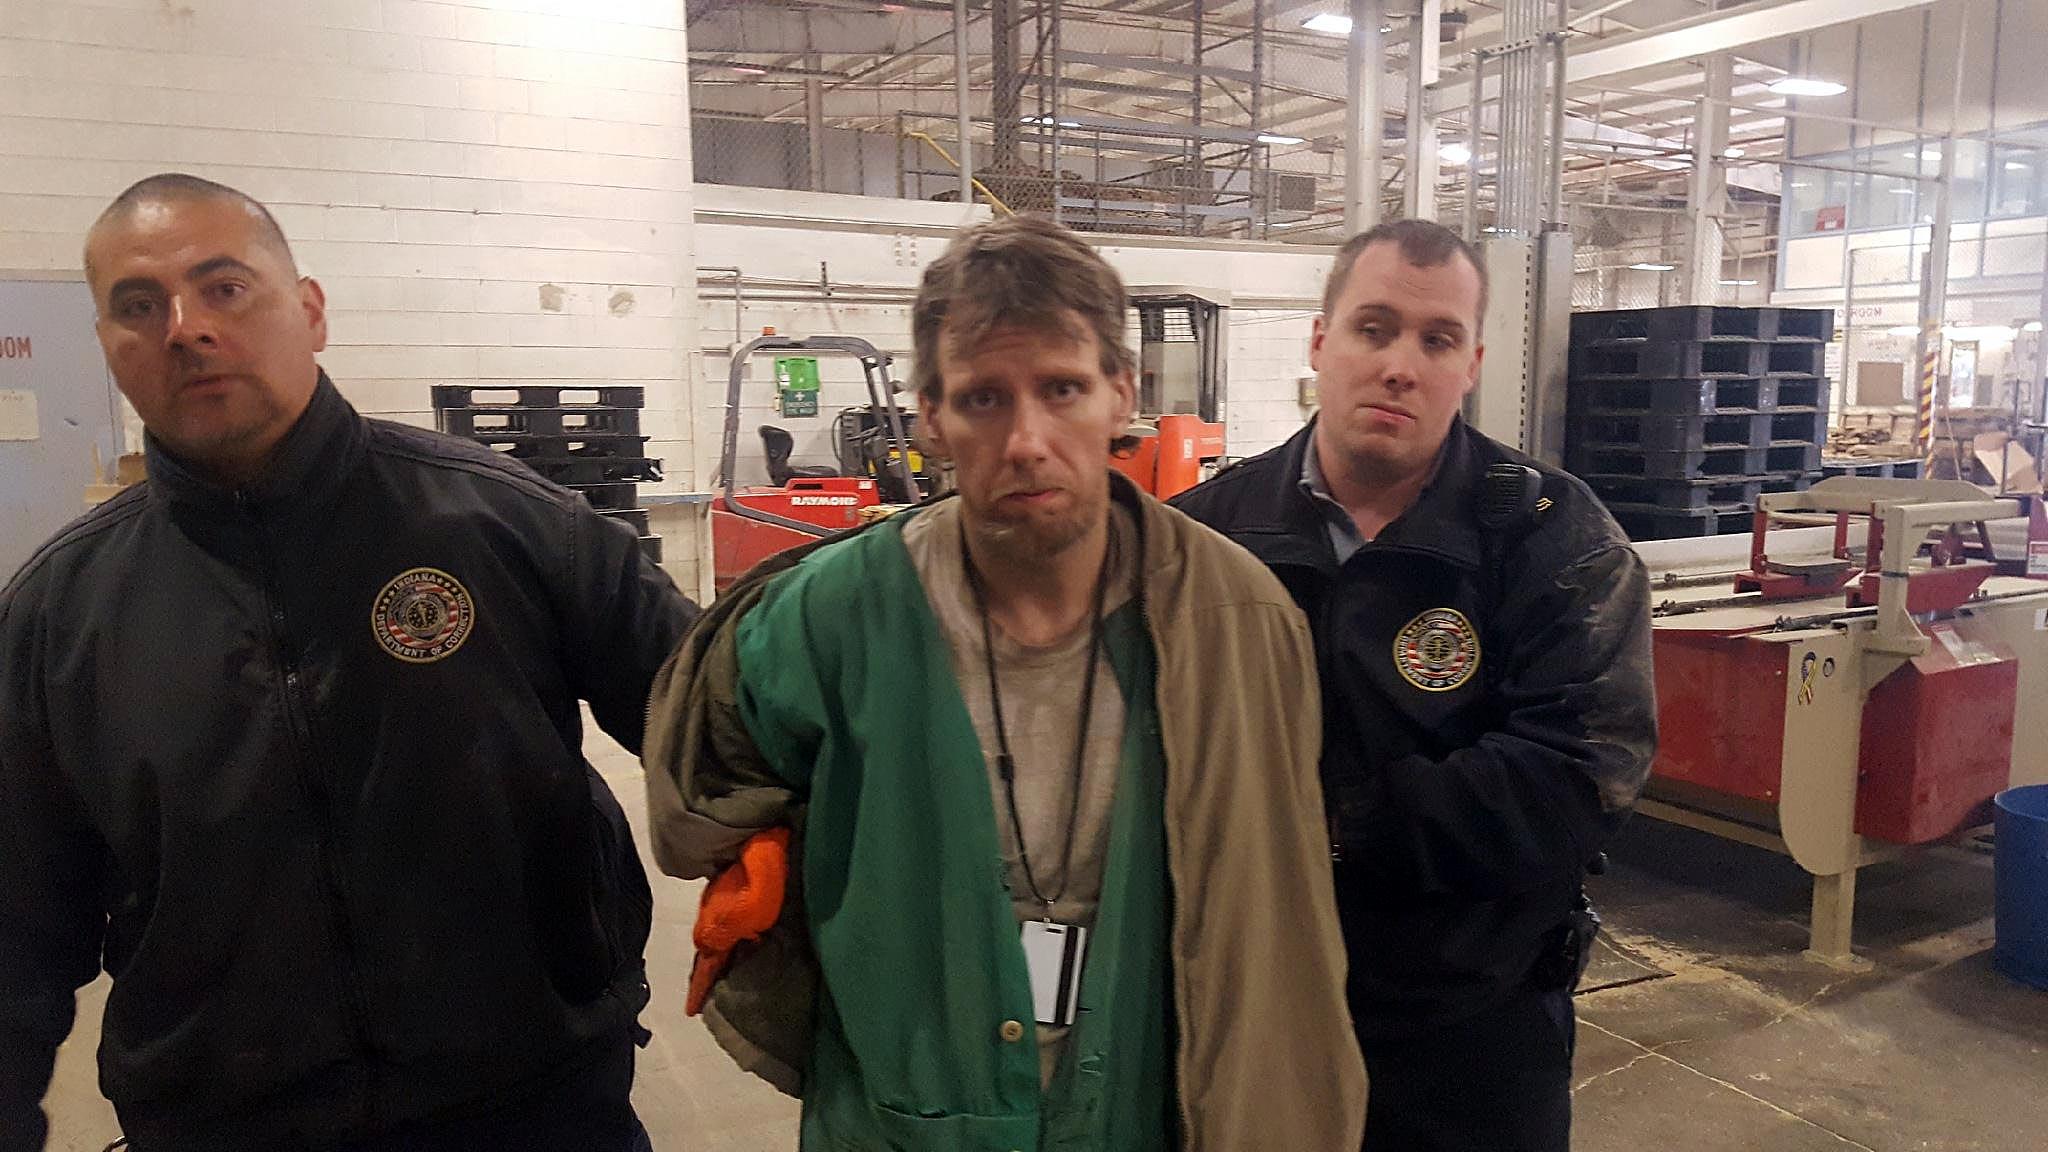 Photo courtesy: Indiana Department of Correction - Facebook